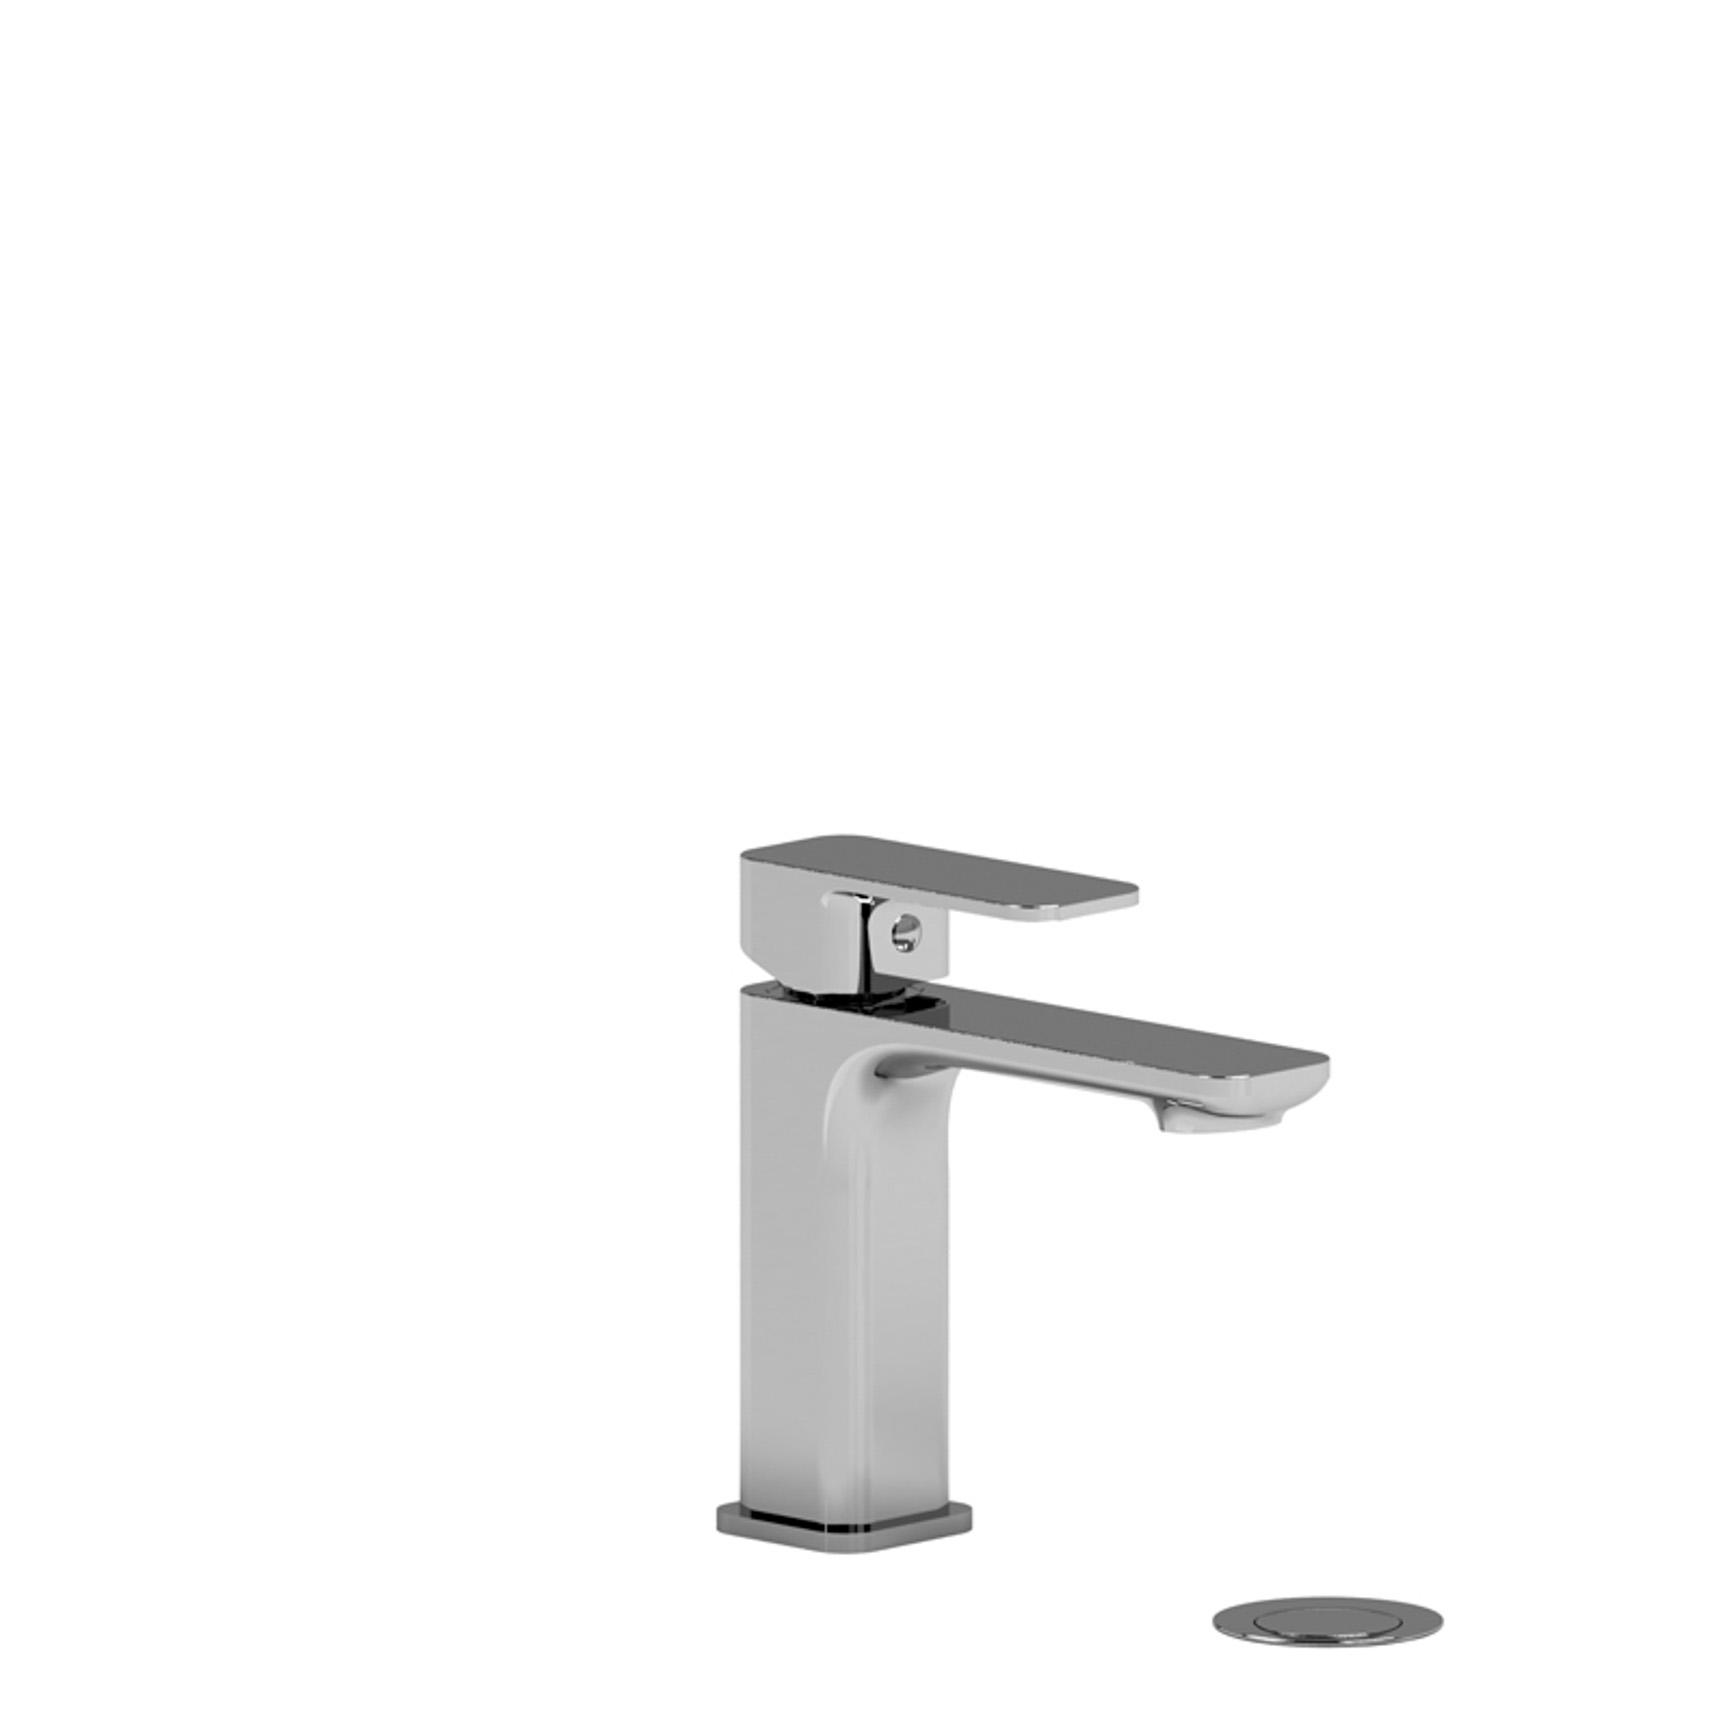 Riobel Equinox Eqs01c Faucet With Push Drain Amati